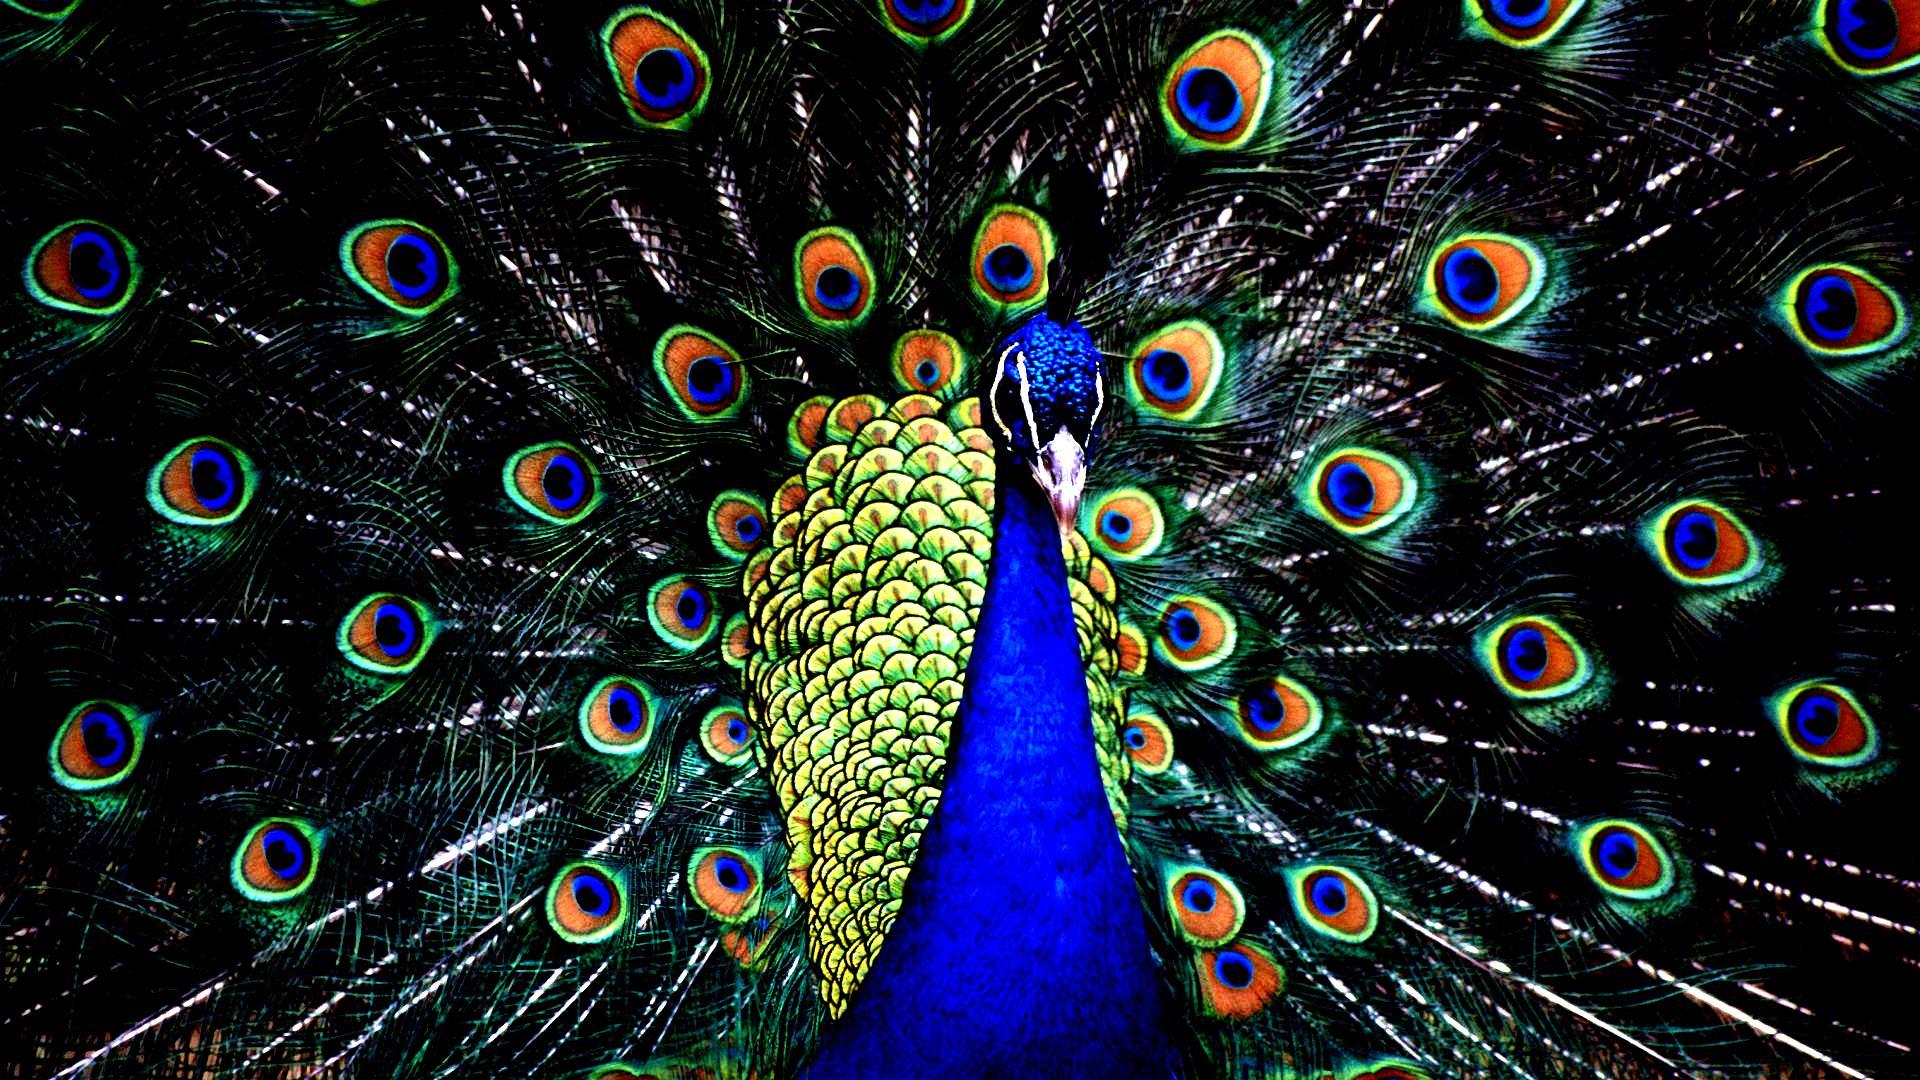 Peacock Download